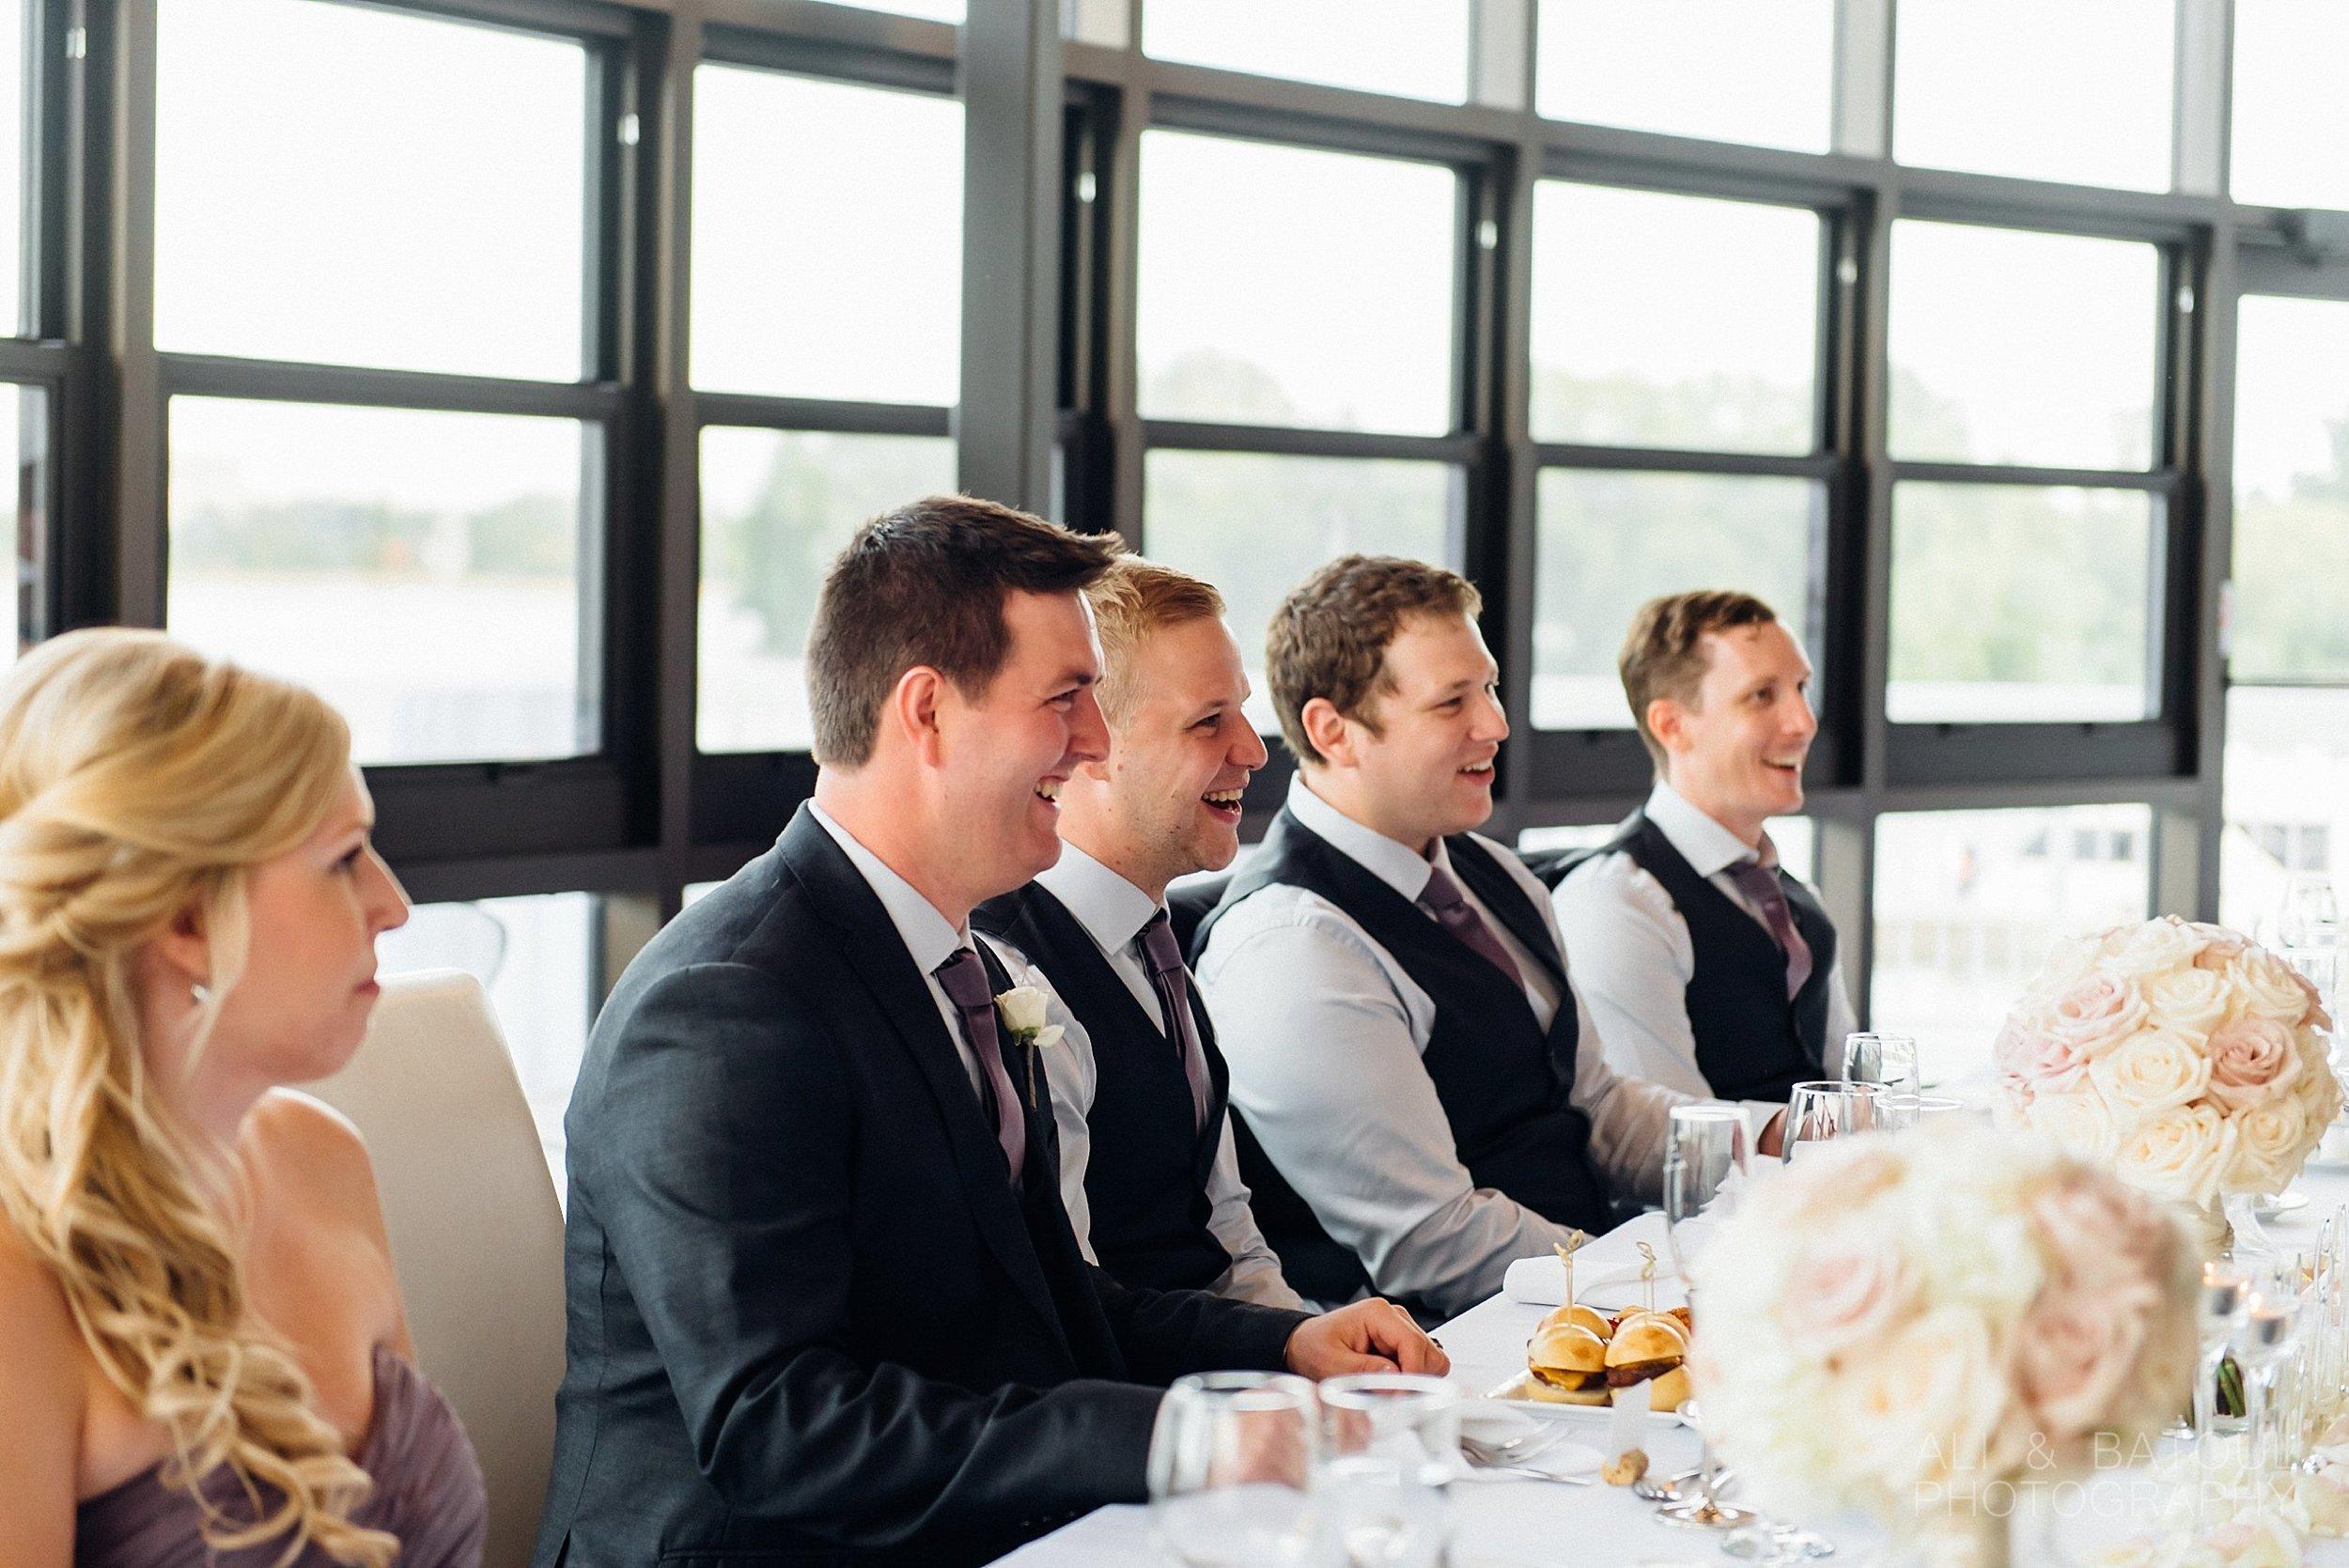 Ali & Batoul Photography - Documentary Fine Art Ottawa Wedding Photography_0081.jpg